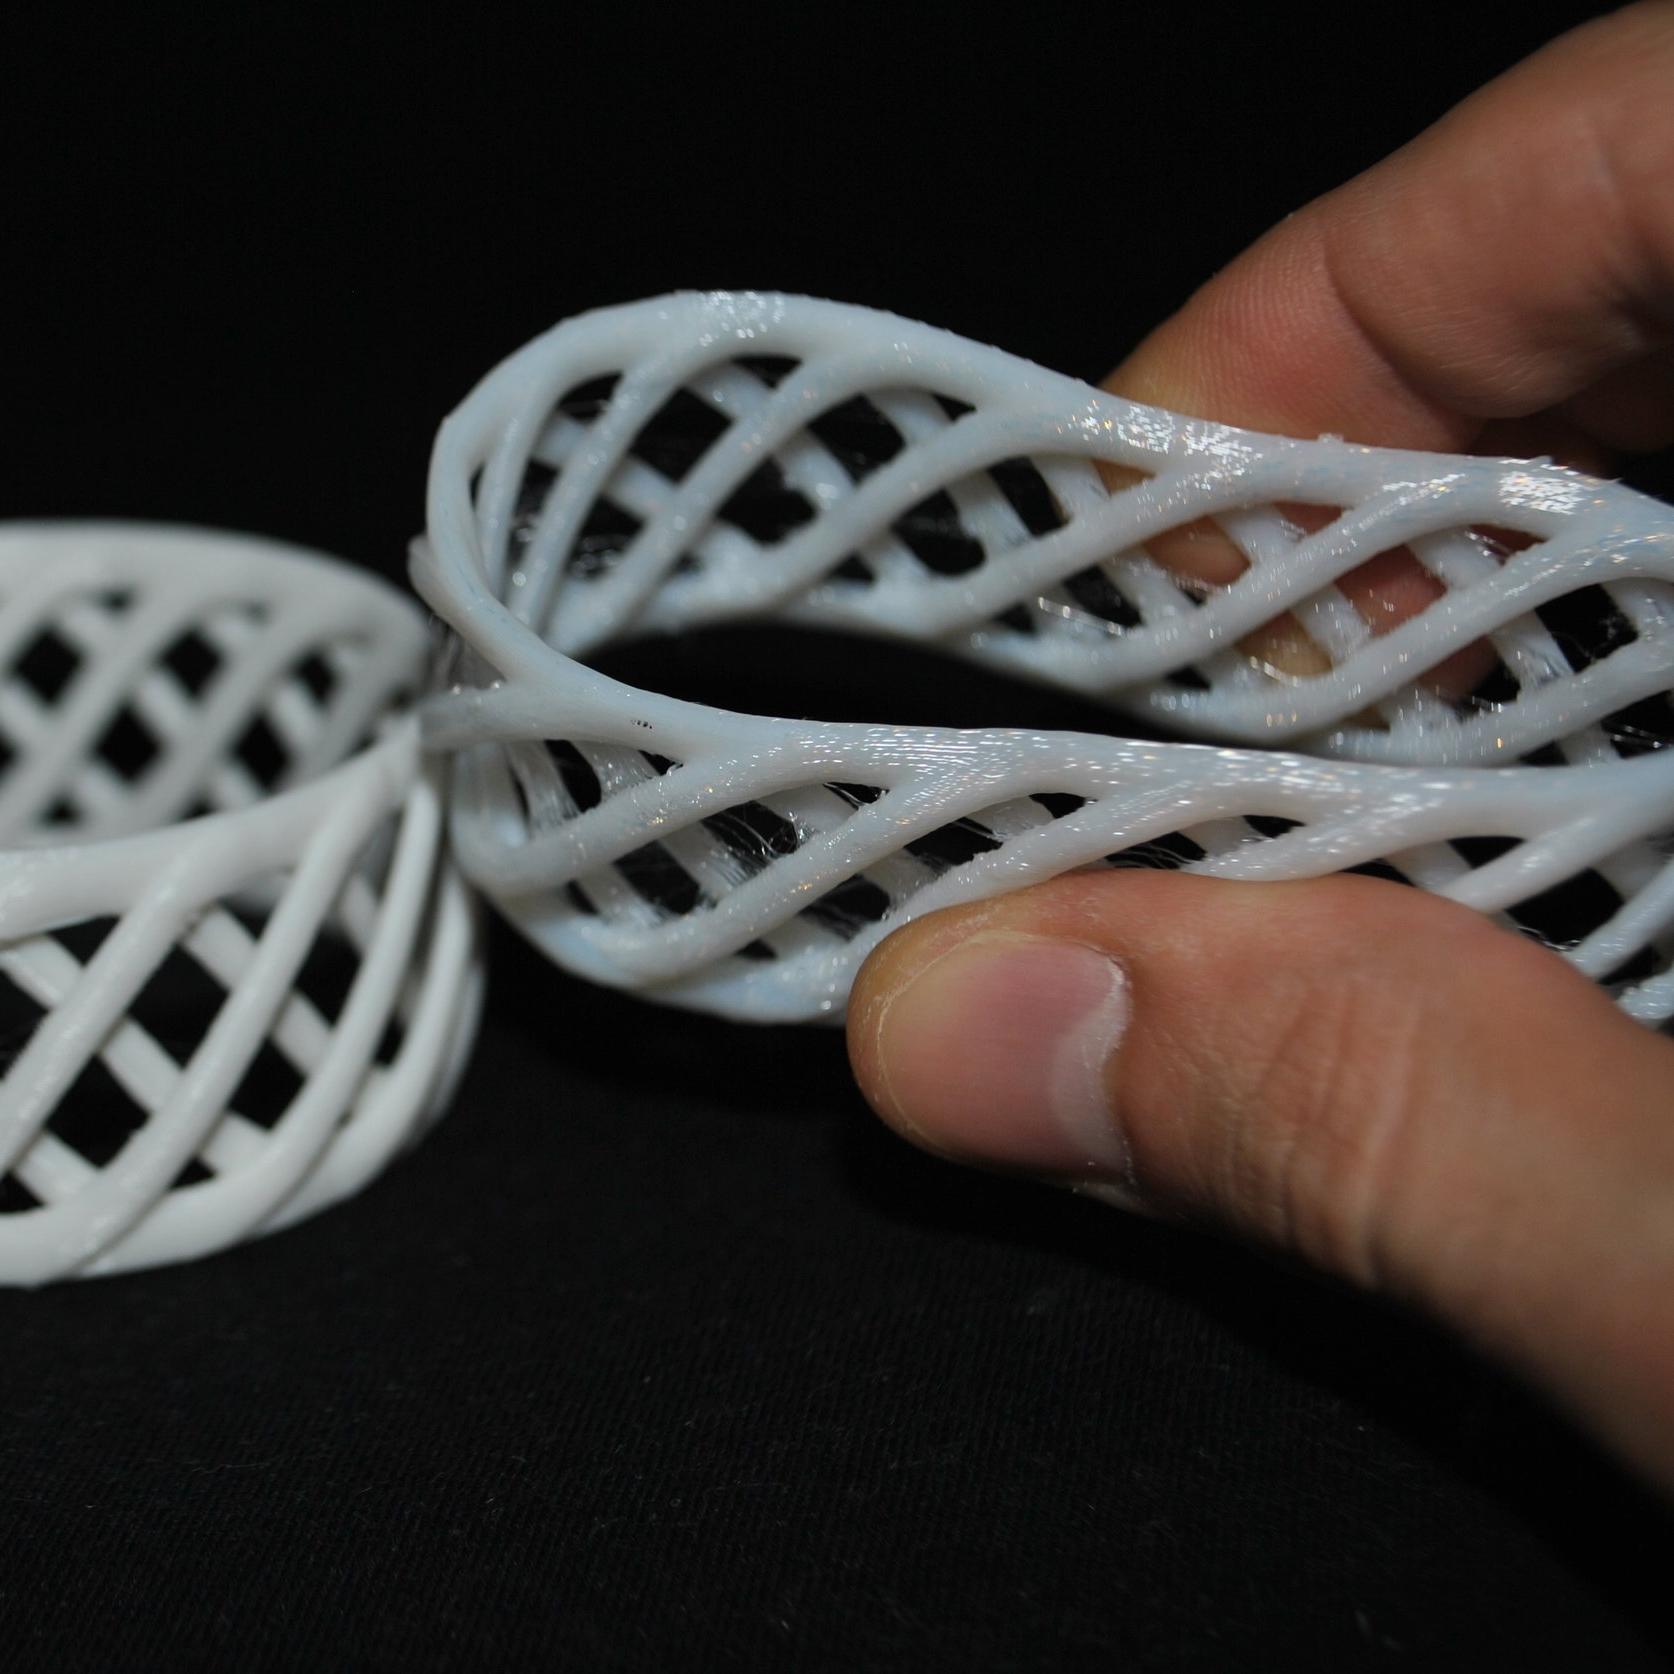 MagnanDesign SLS 3D Printing